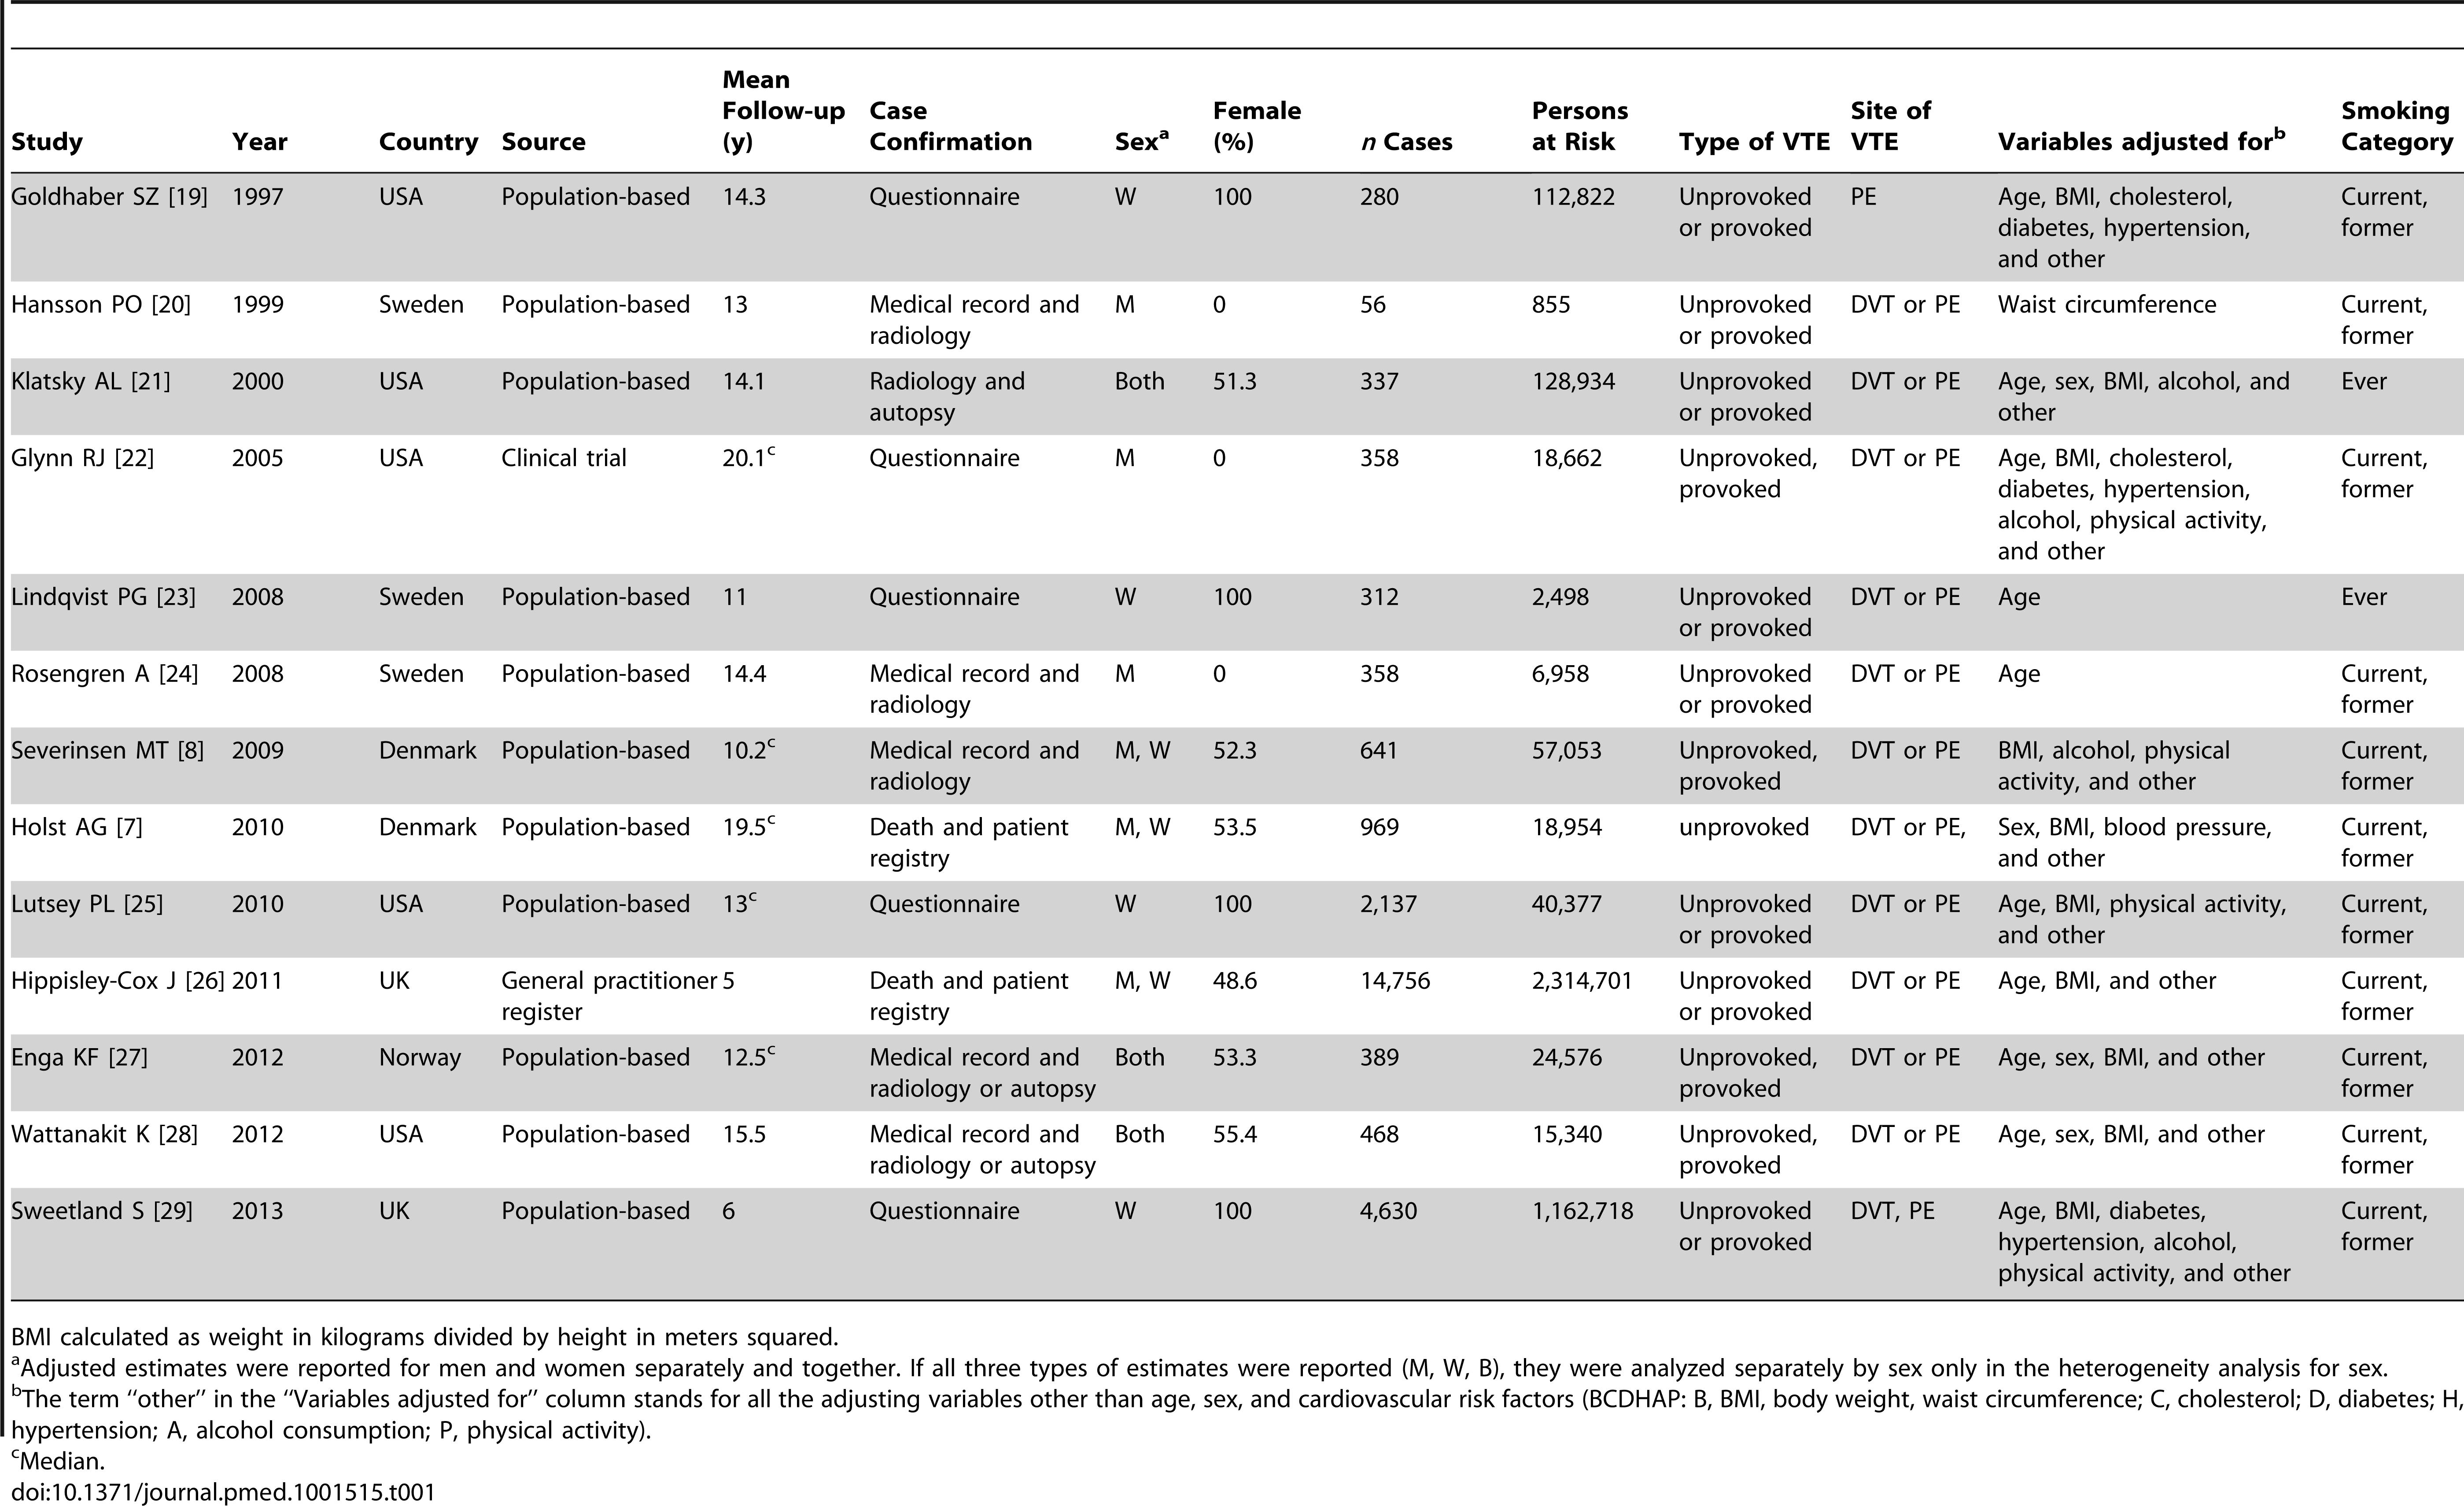 Cohort studies reporting incidence risk estimates.